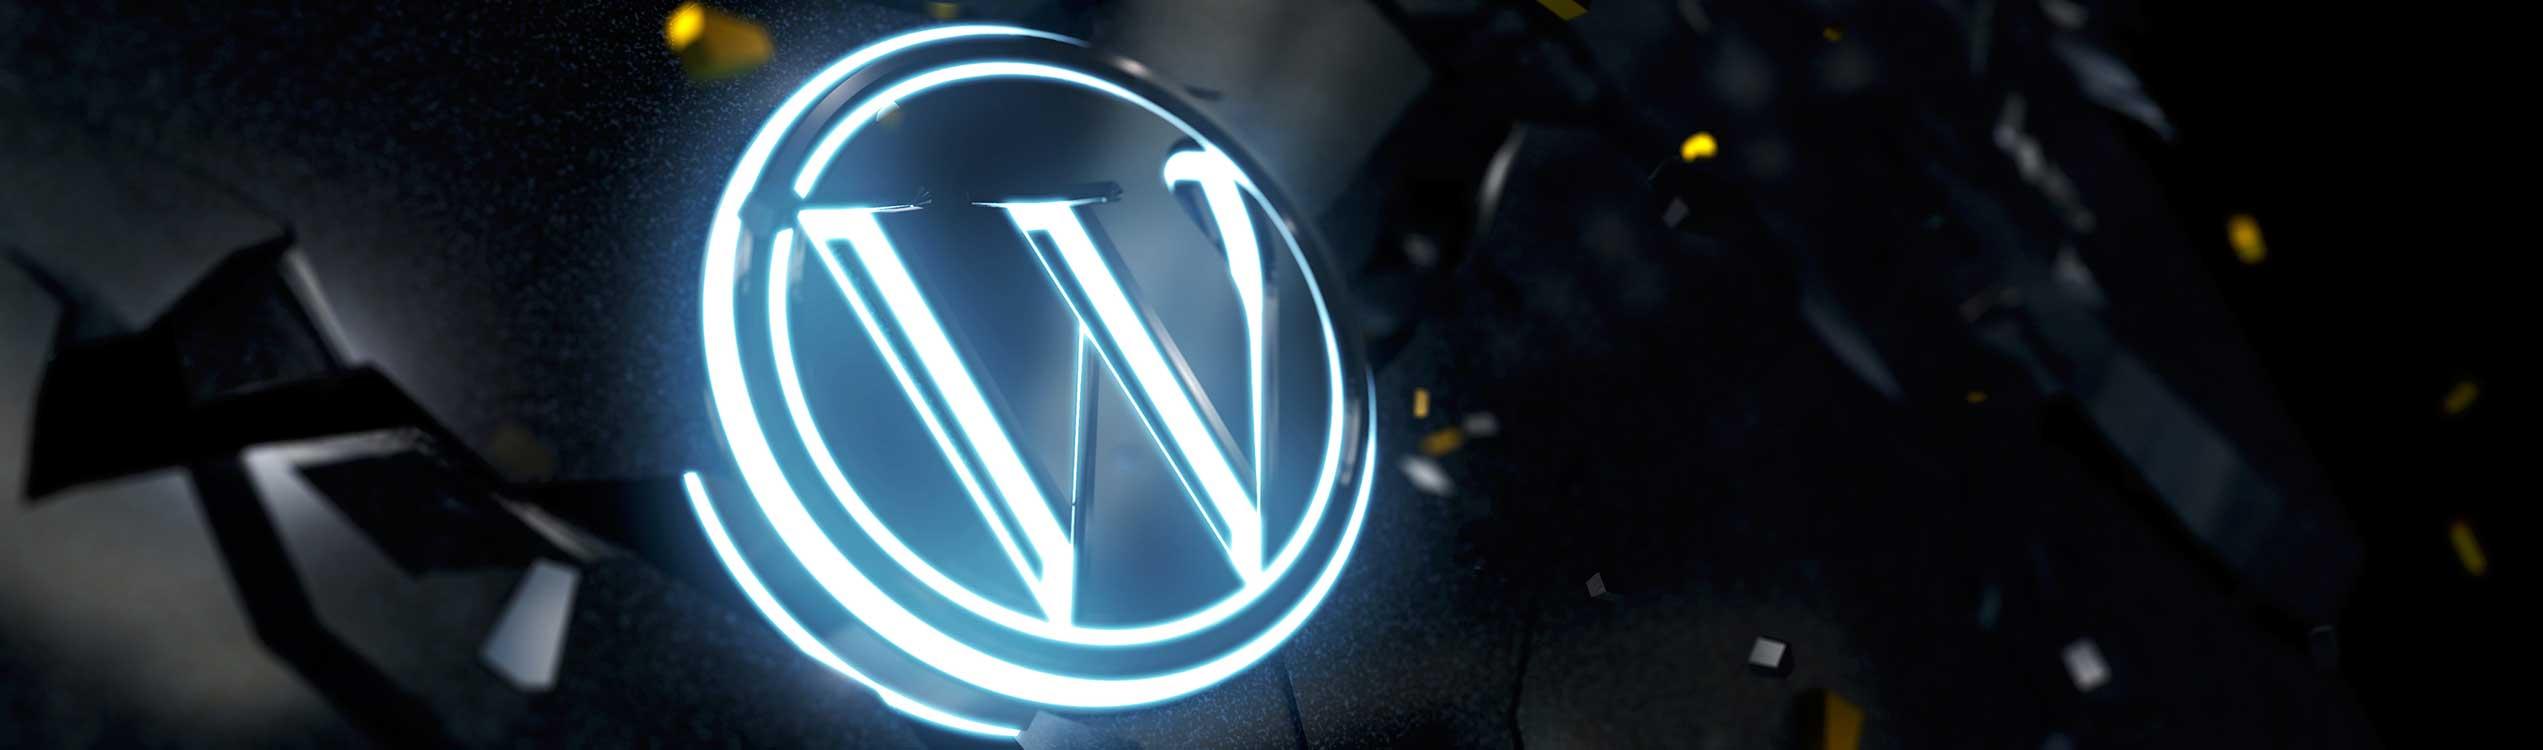 WordPress Agentur Titlebild